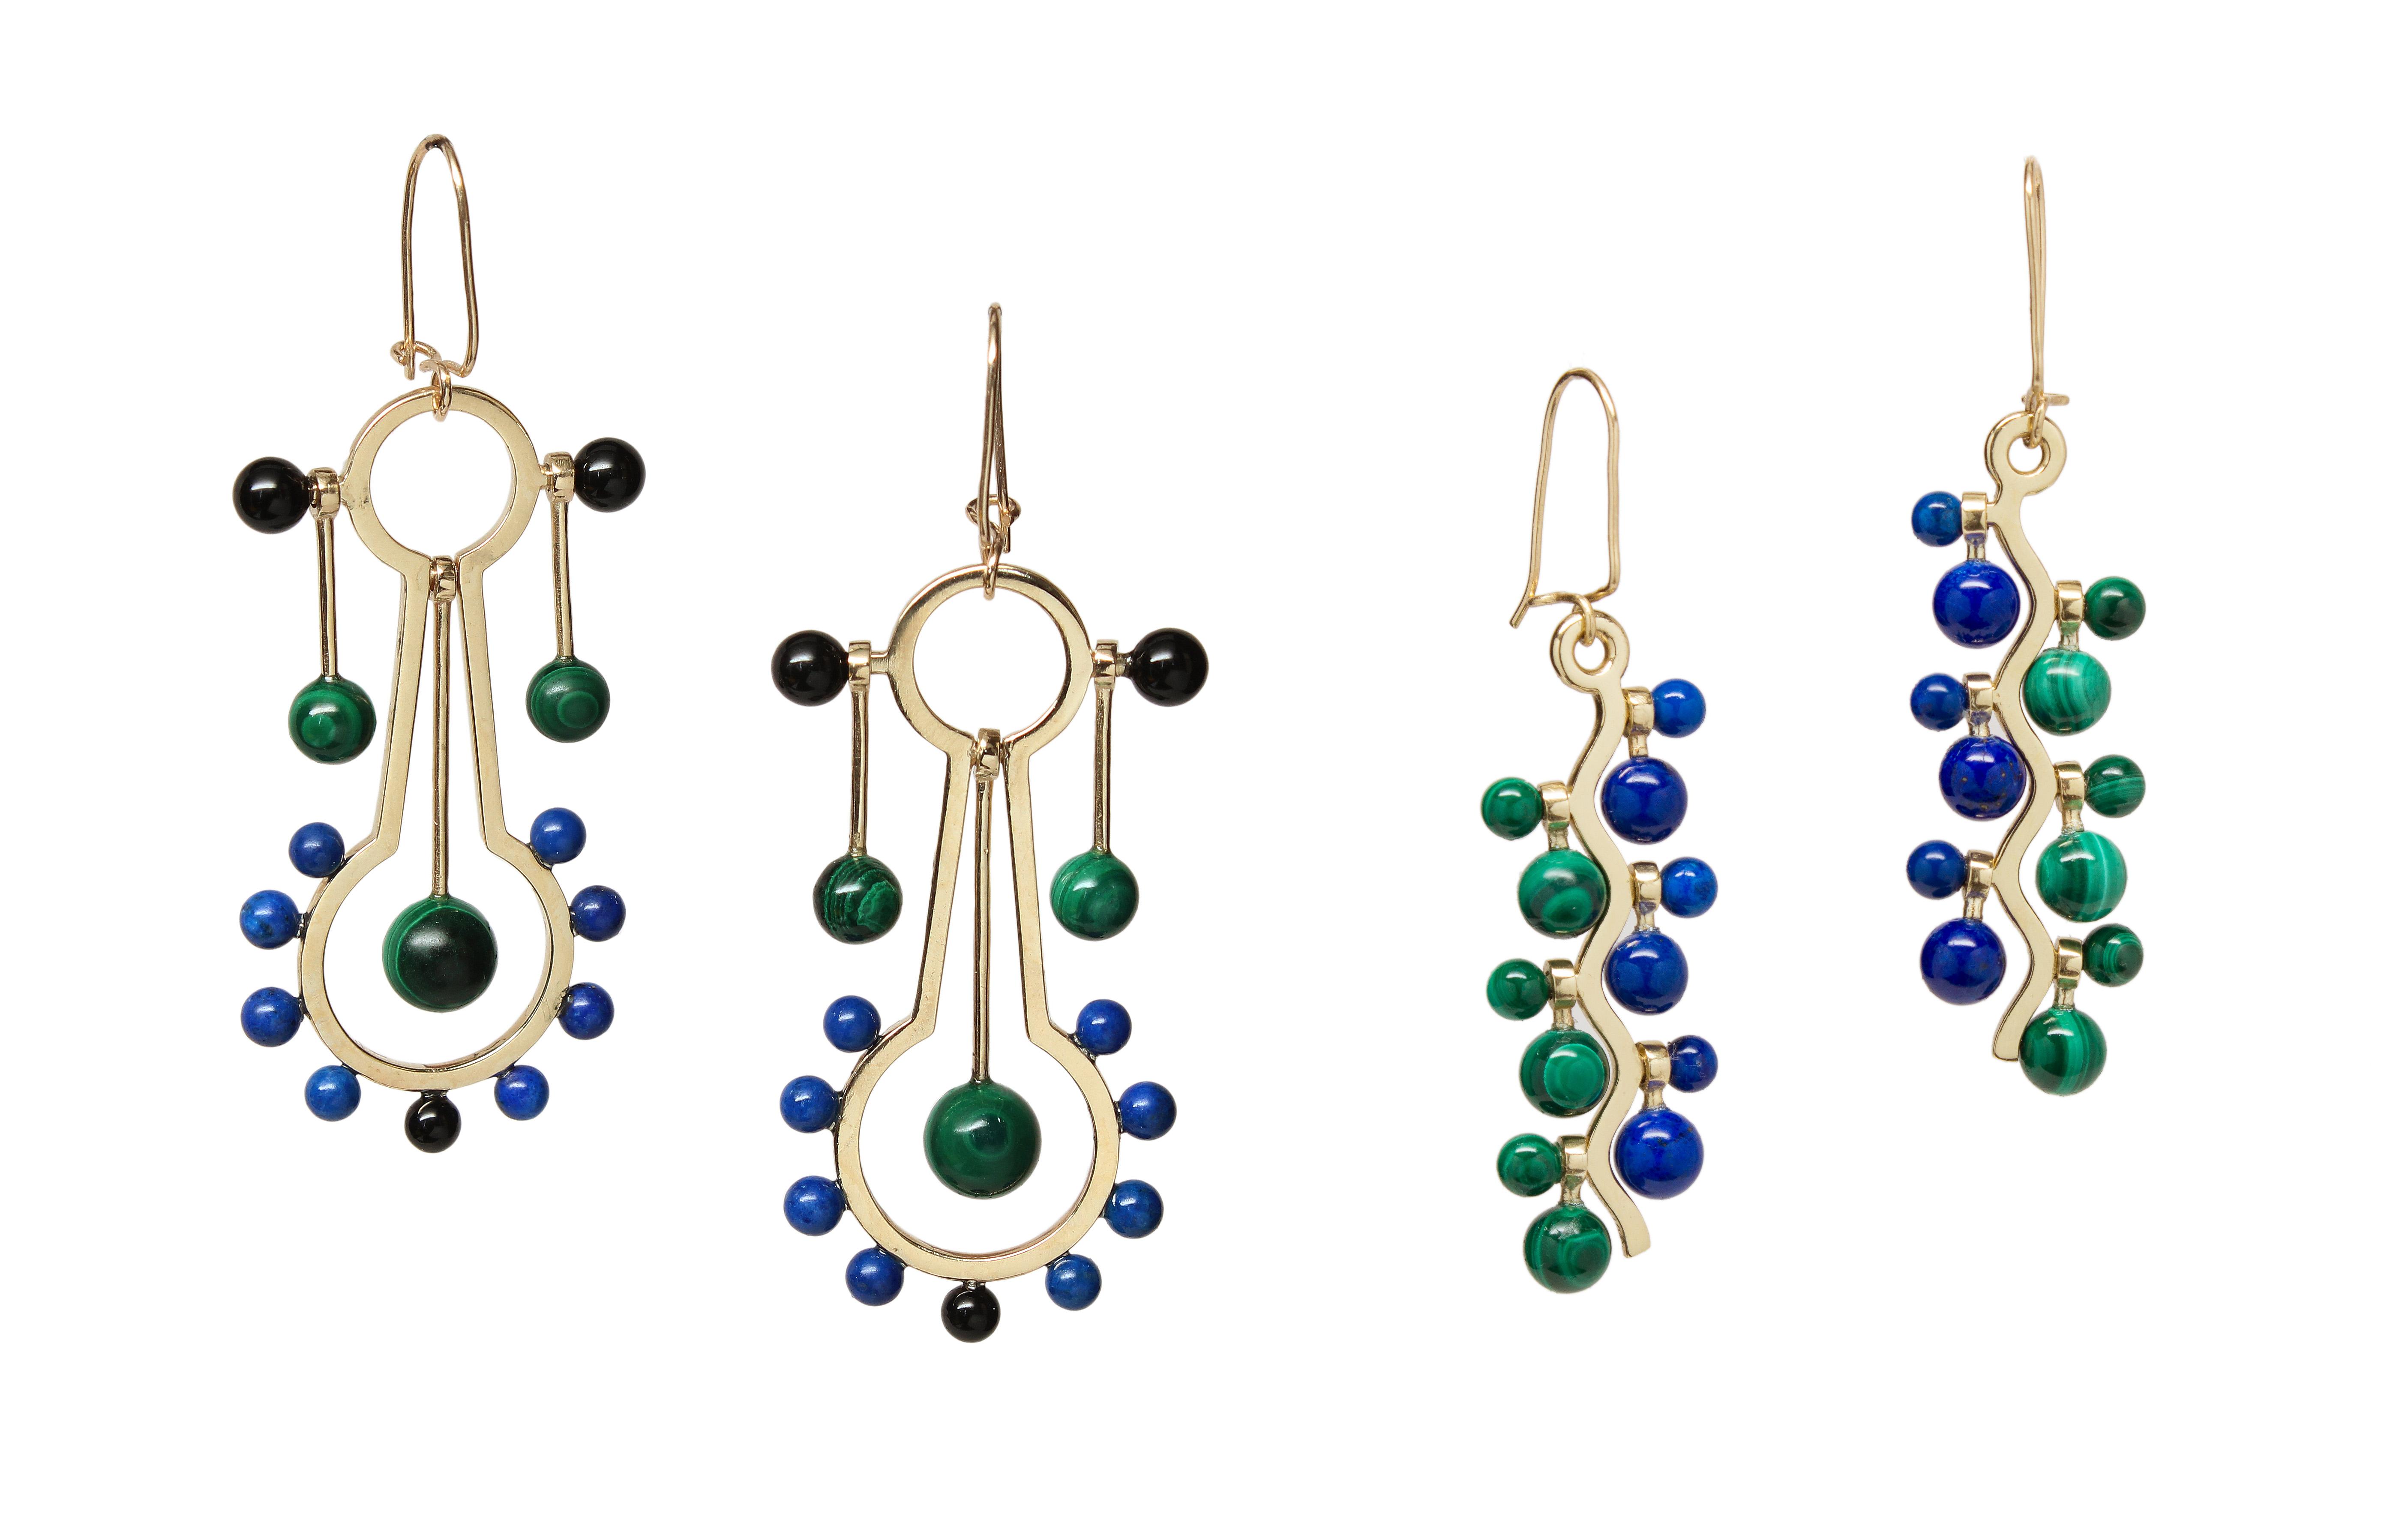 Pendulum Earrings and Cosine Drop Earrings